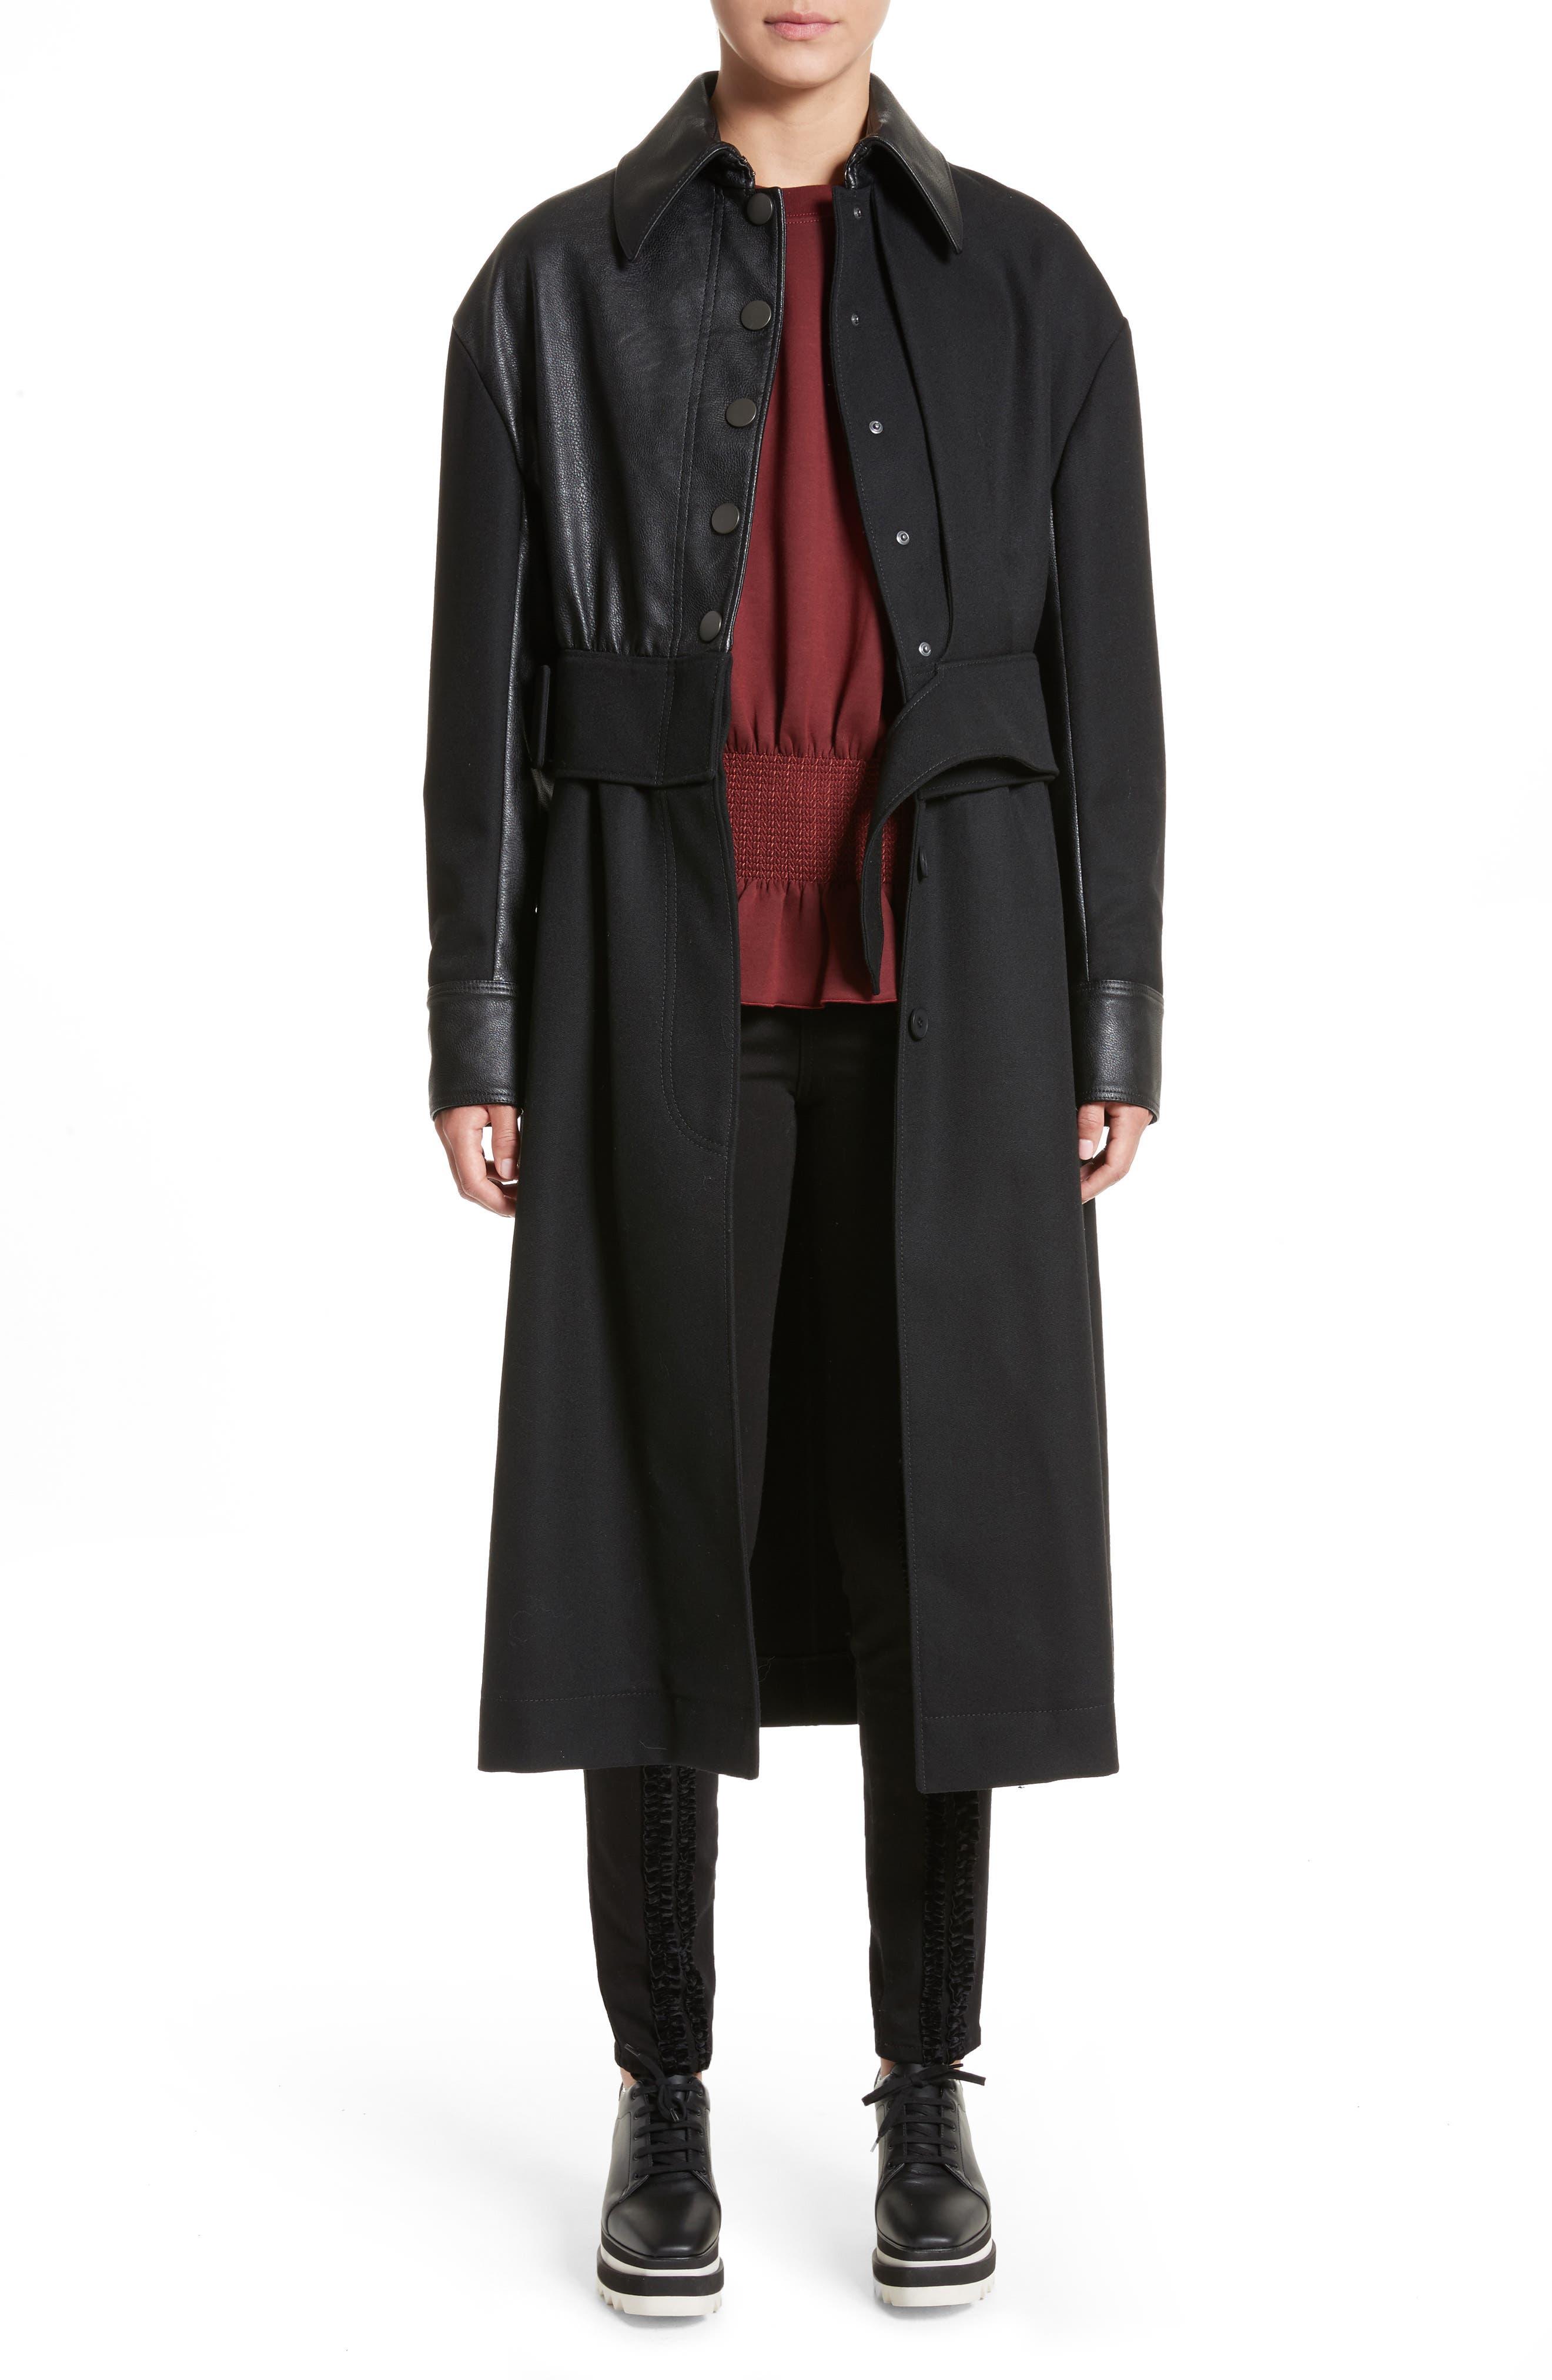 Stella McCartney Eden Alter Leather Trim Wool Coat